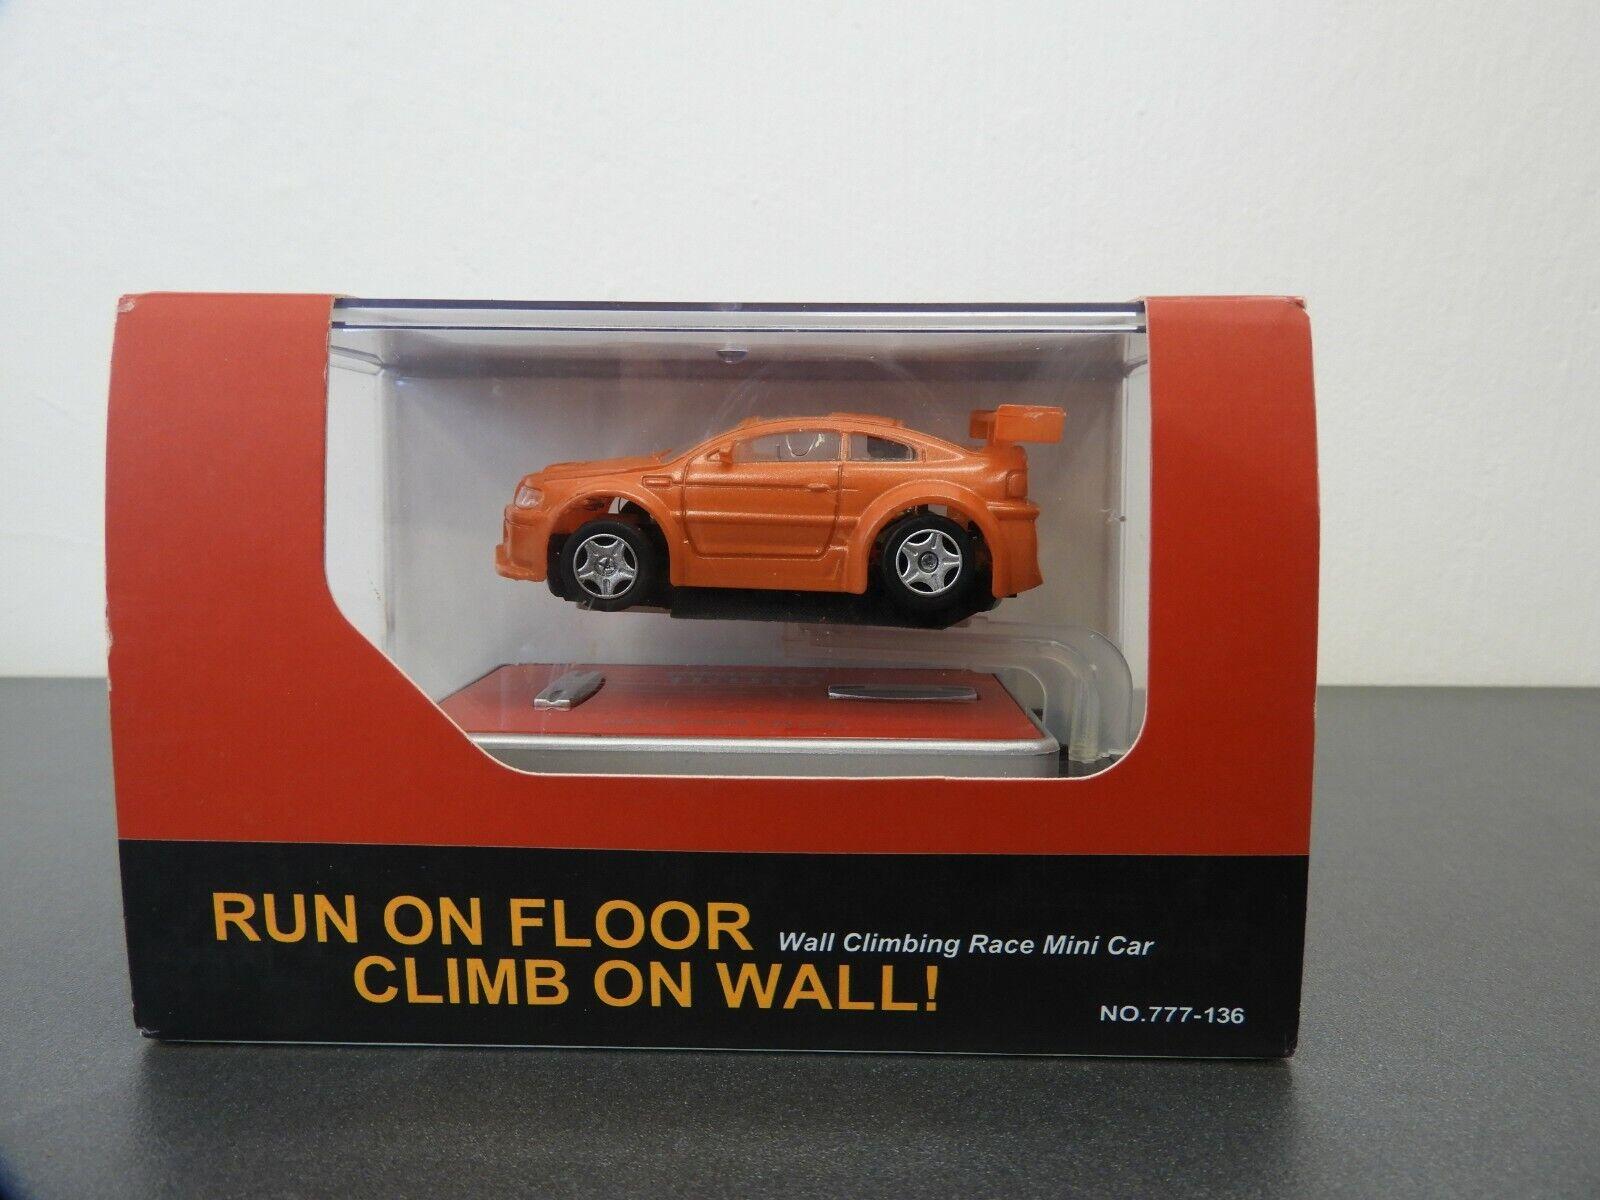 INFRArot CONTROL,WALL CLIMBING RACE MINI CAR, , DIECAST, 1 58 SCALE, NO  777-136